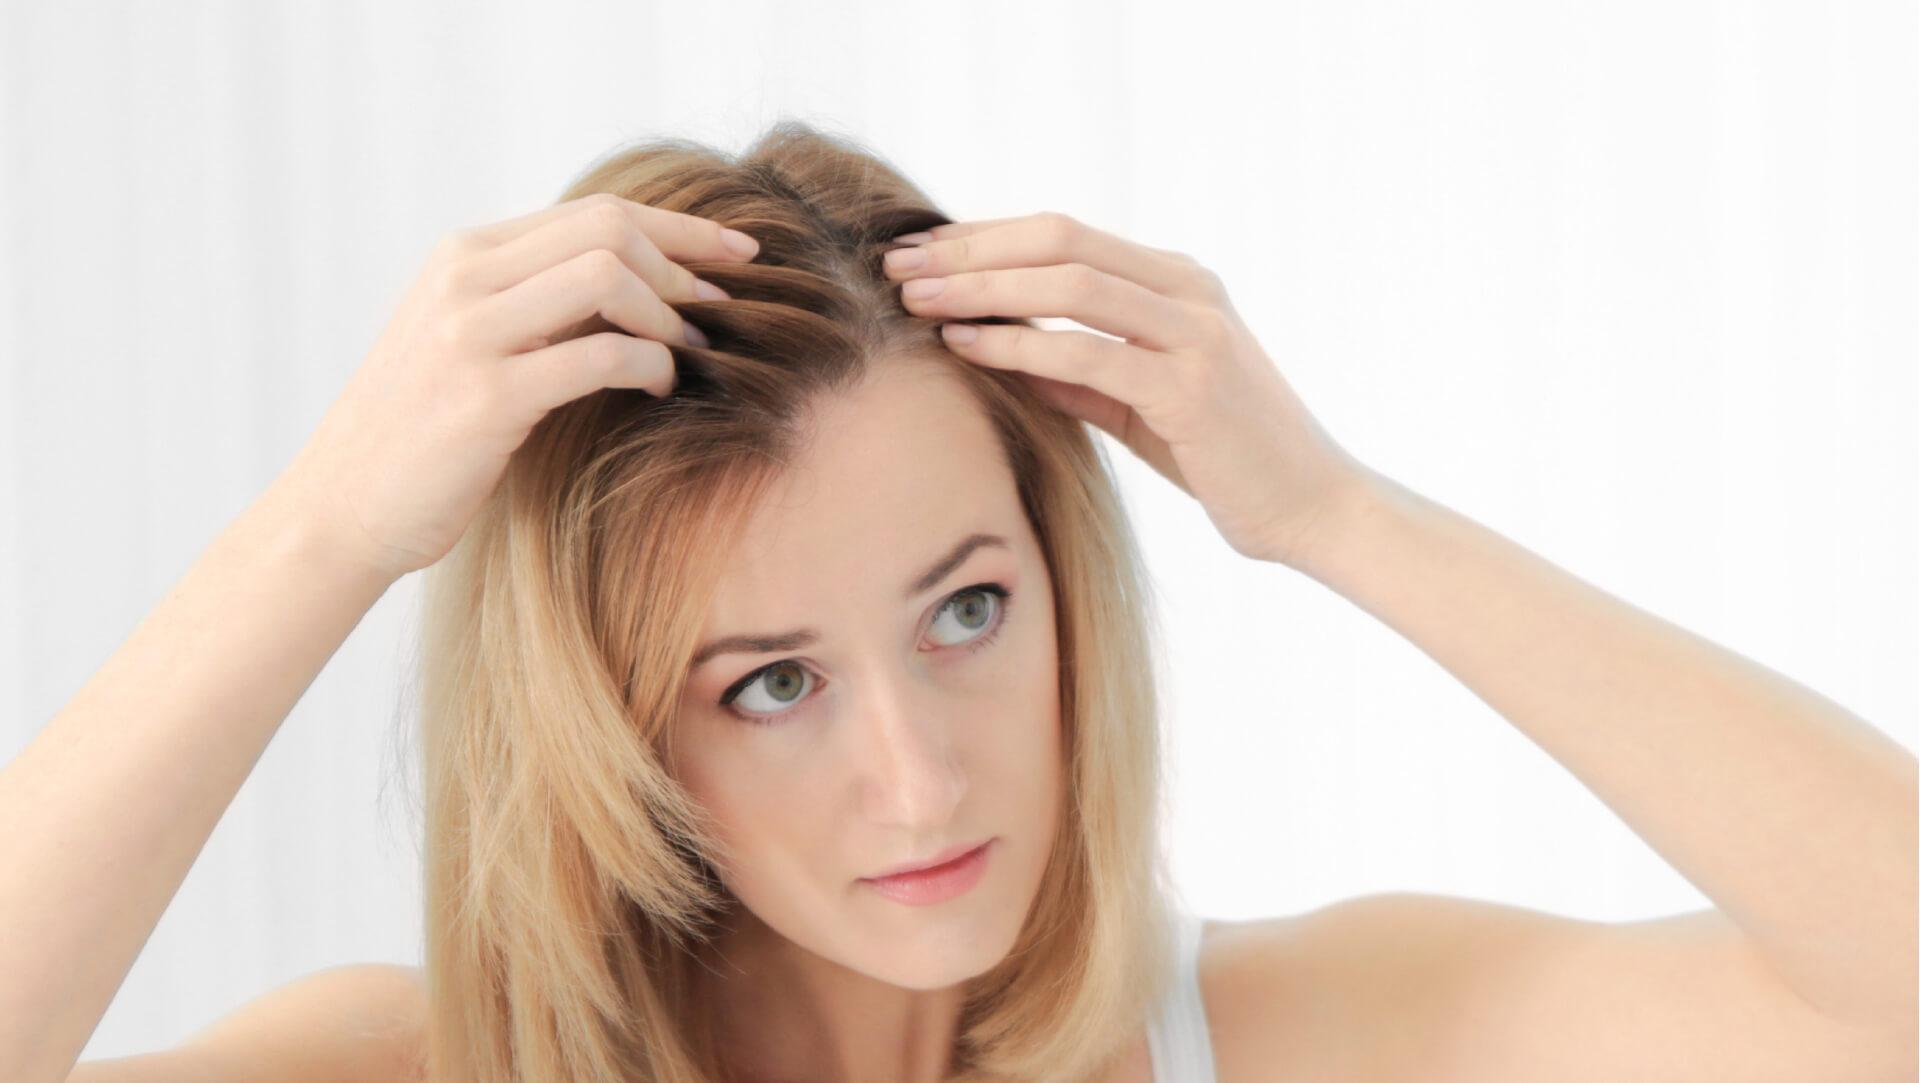 Hair Loss Treatment in Pakistan